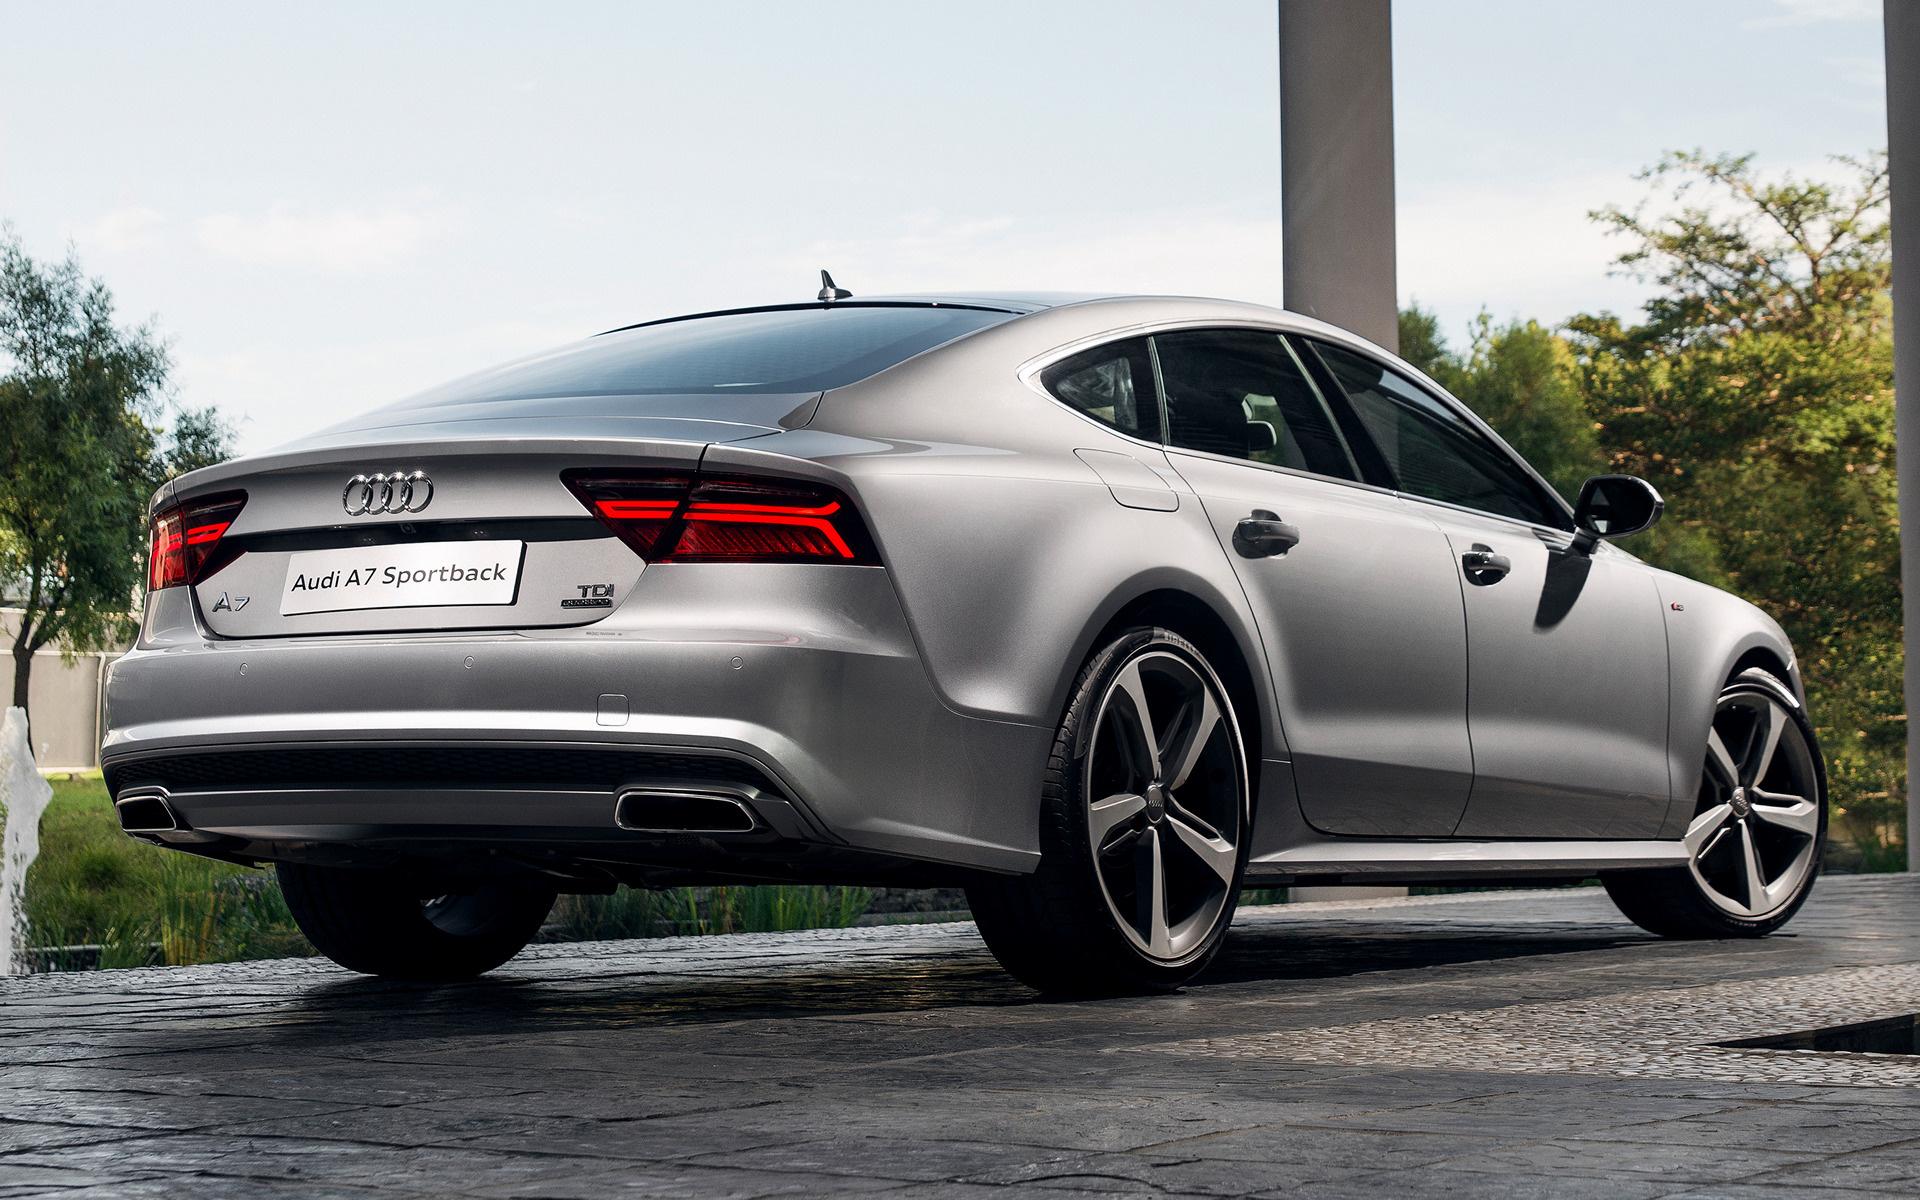 Kelebihan Audi A7 2015 Murah Berkualitas